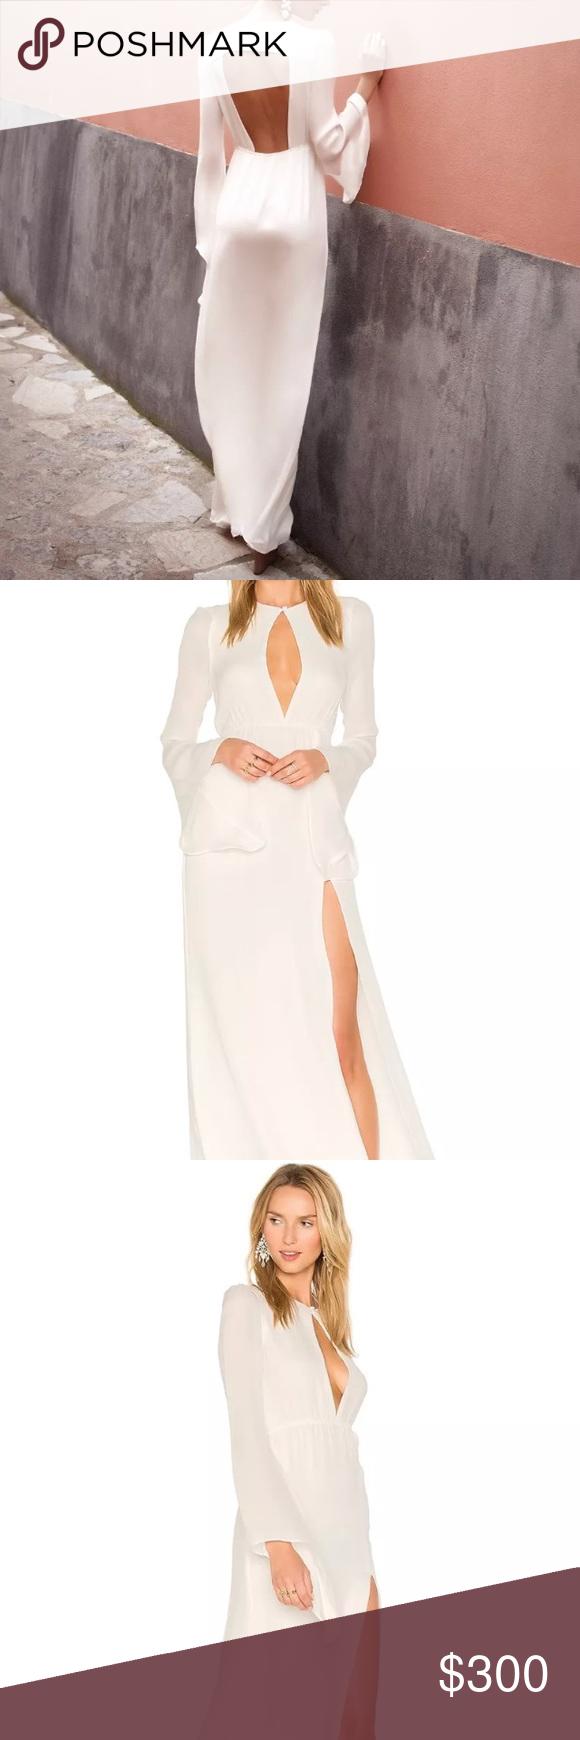 Beautiful Stone Cold Fox Wedding Dress Images - Styles & Ideas 2018 ...